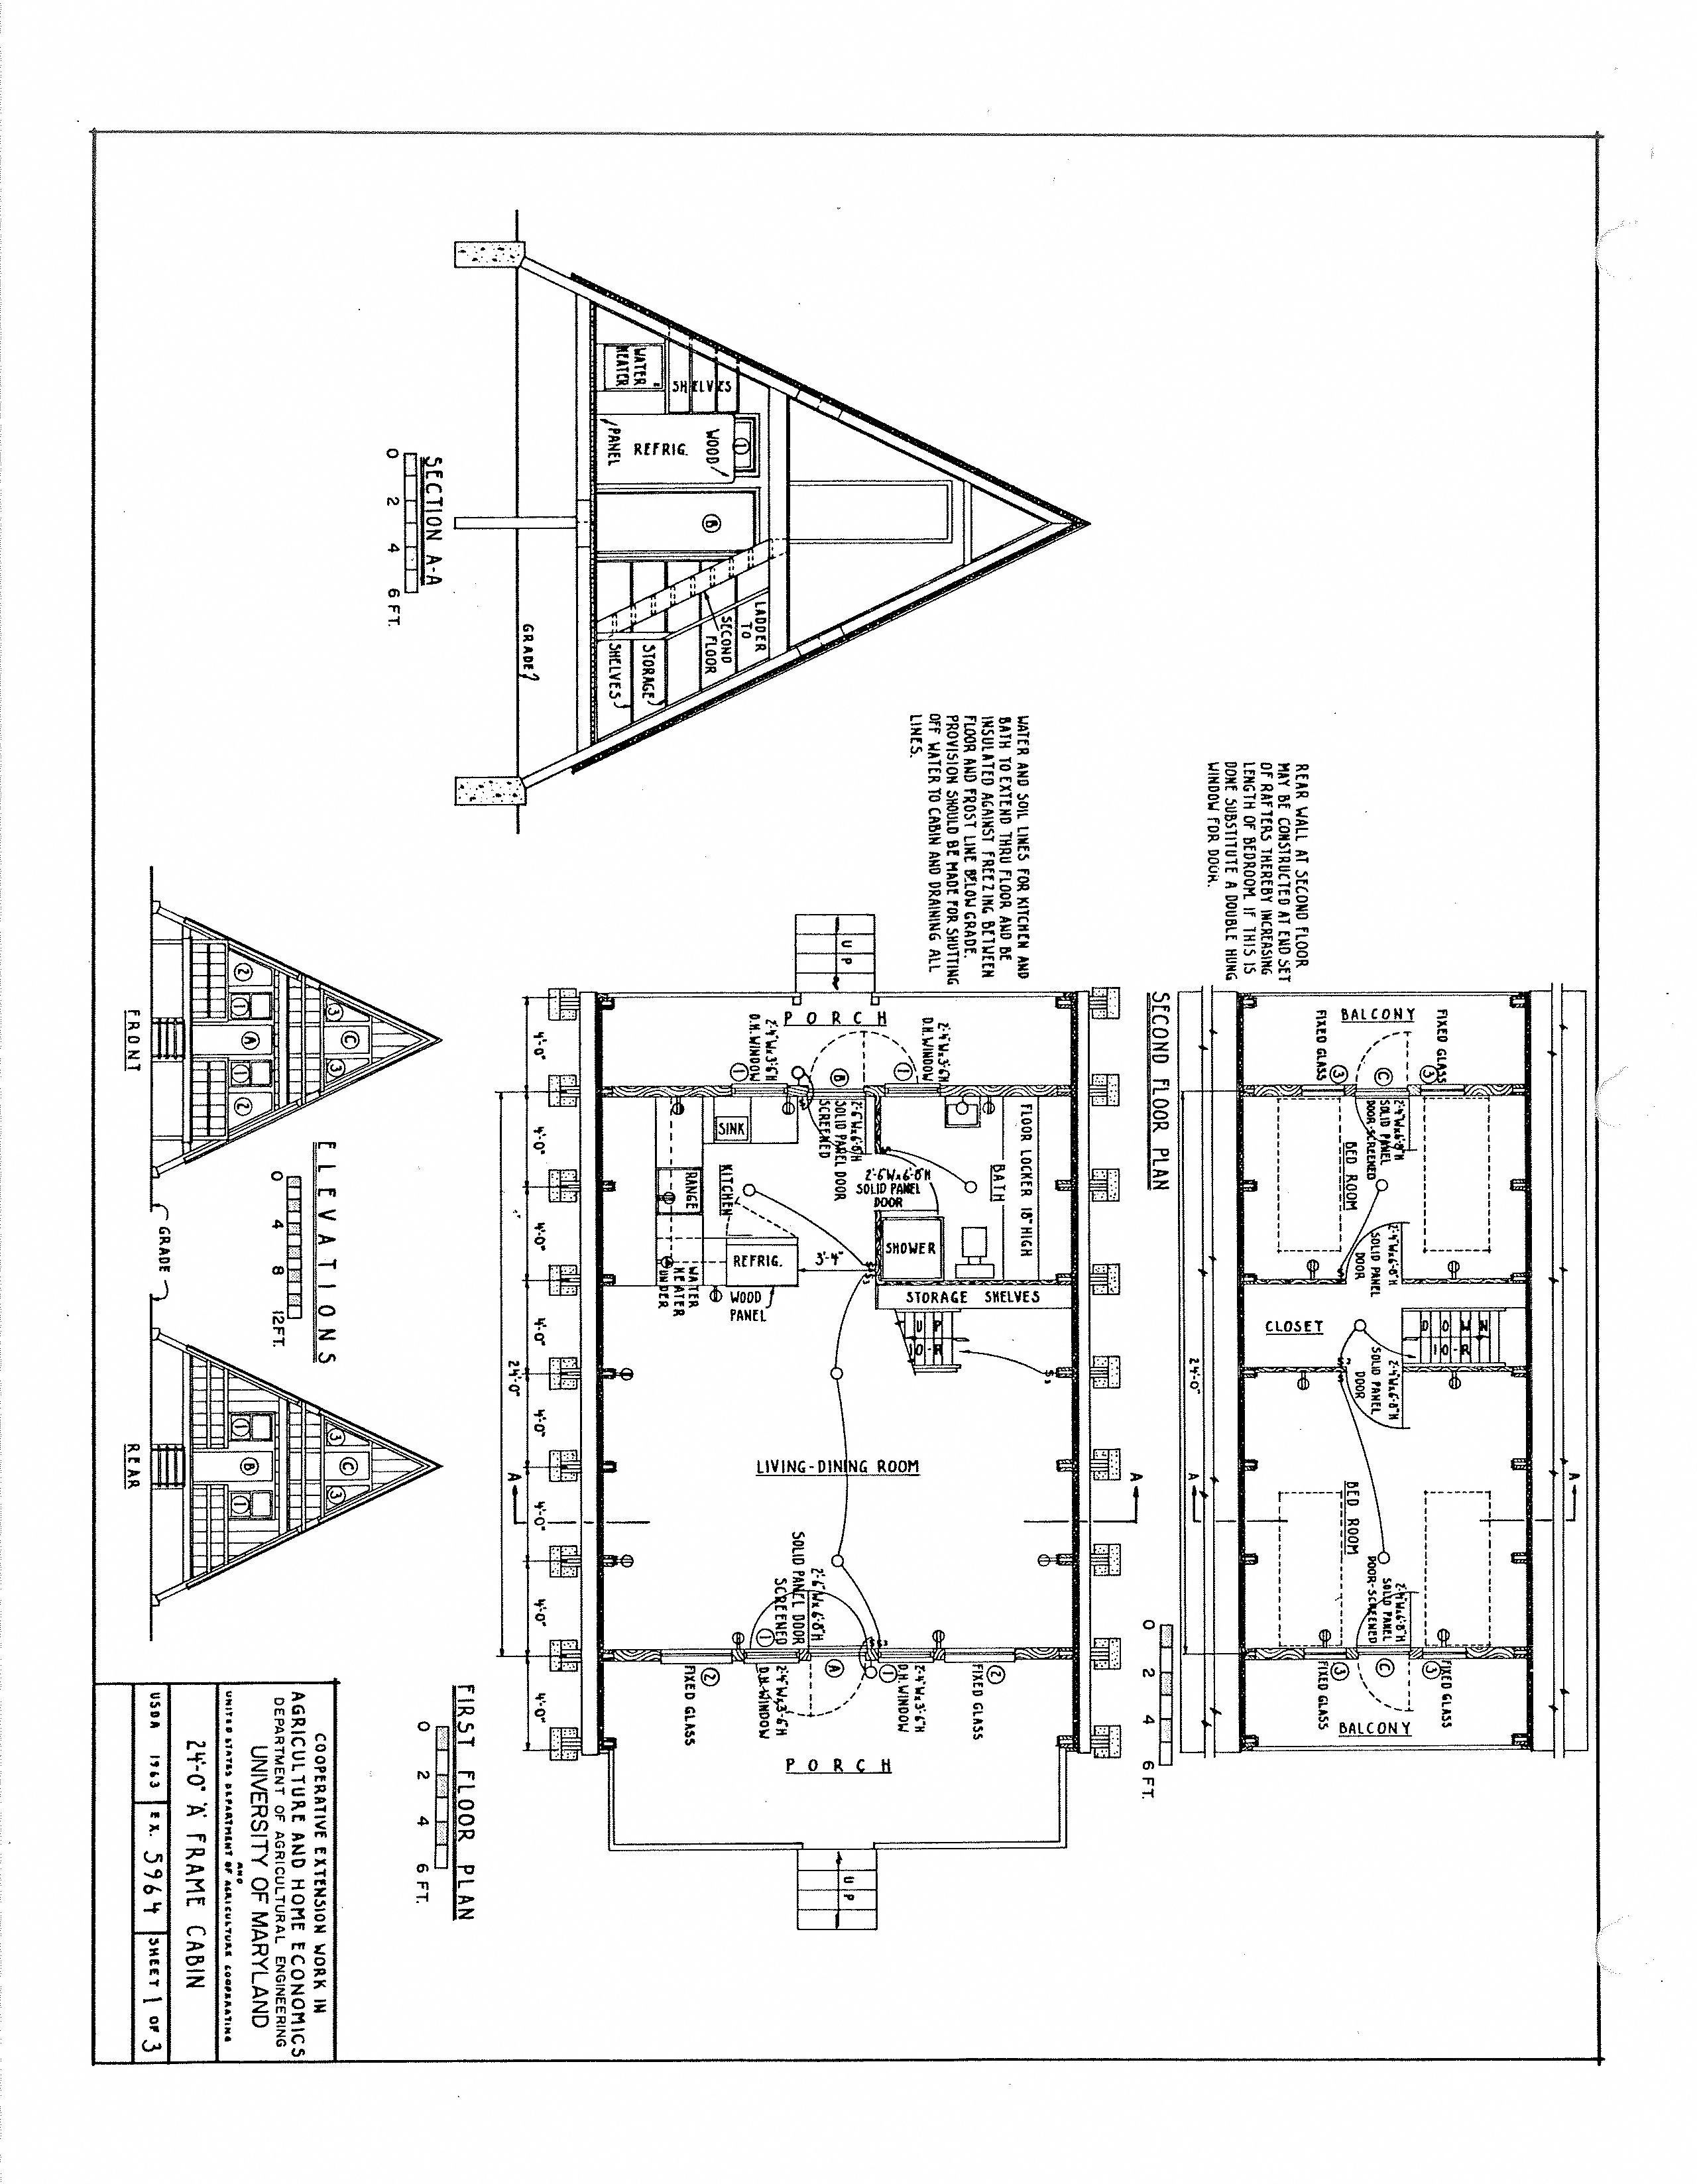 Free A Frame Cabin Plans Blueprints Construction Documents Sds Plans A Framehouse A Frame House Plans A Frame Cabin Plans A Frame House